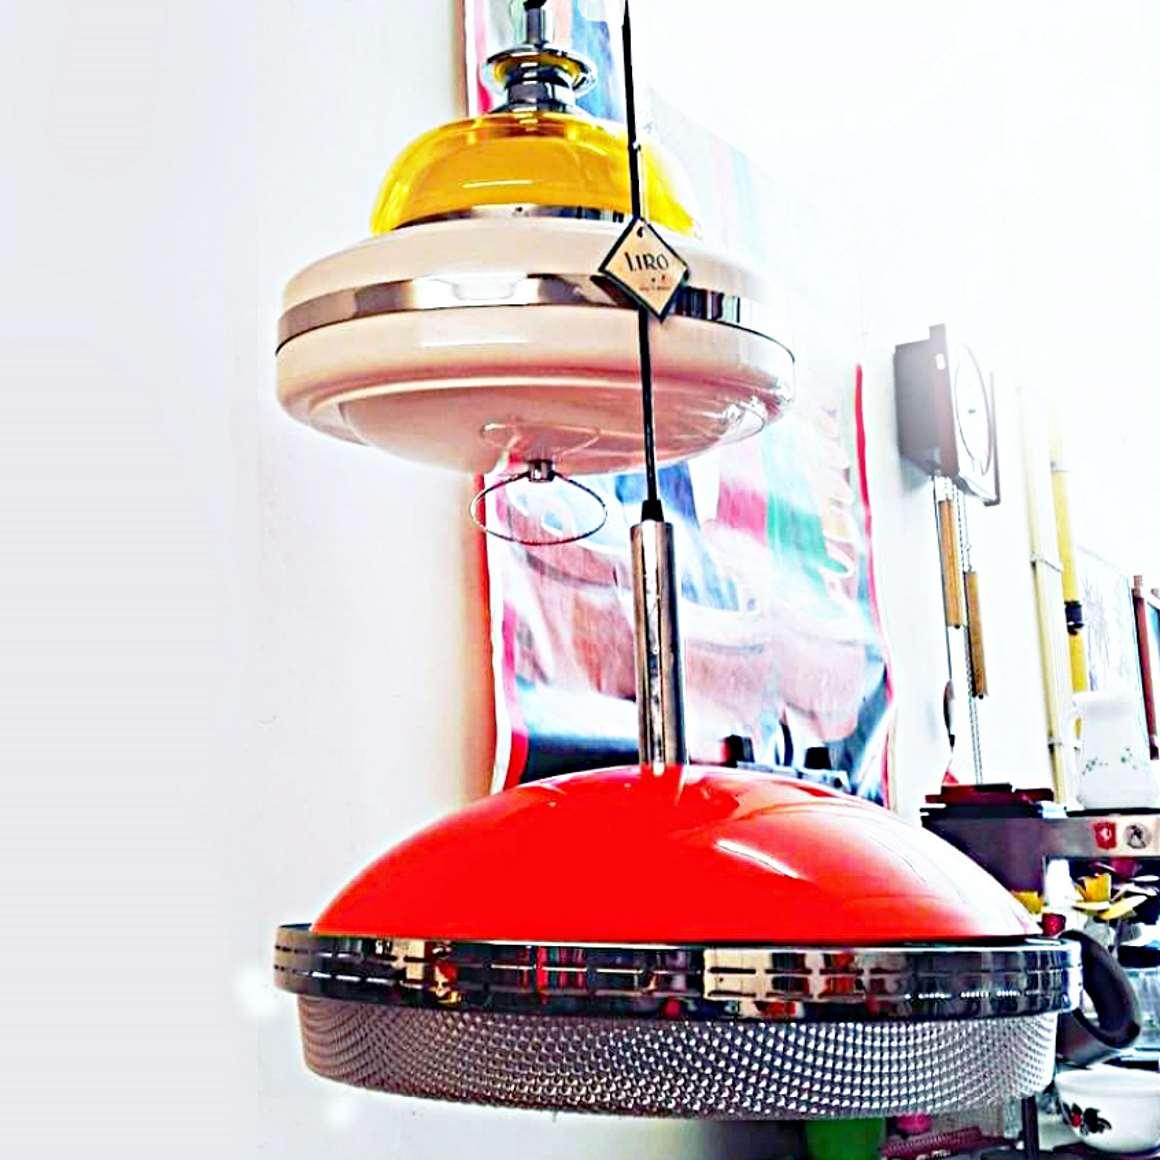 Liro Pendant Lights - Label